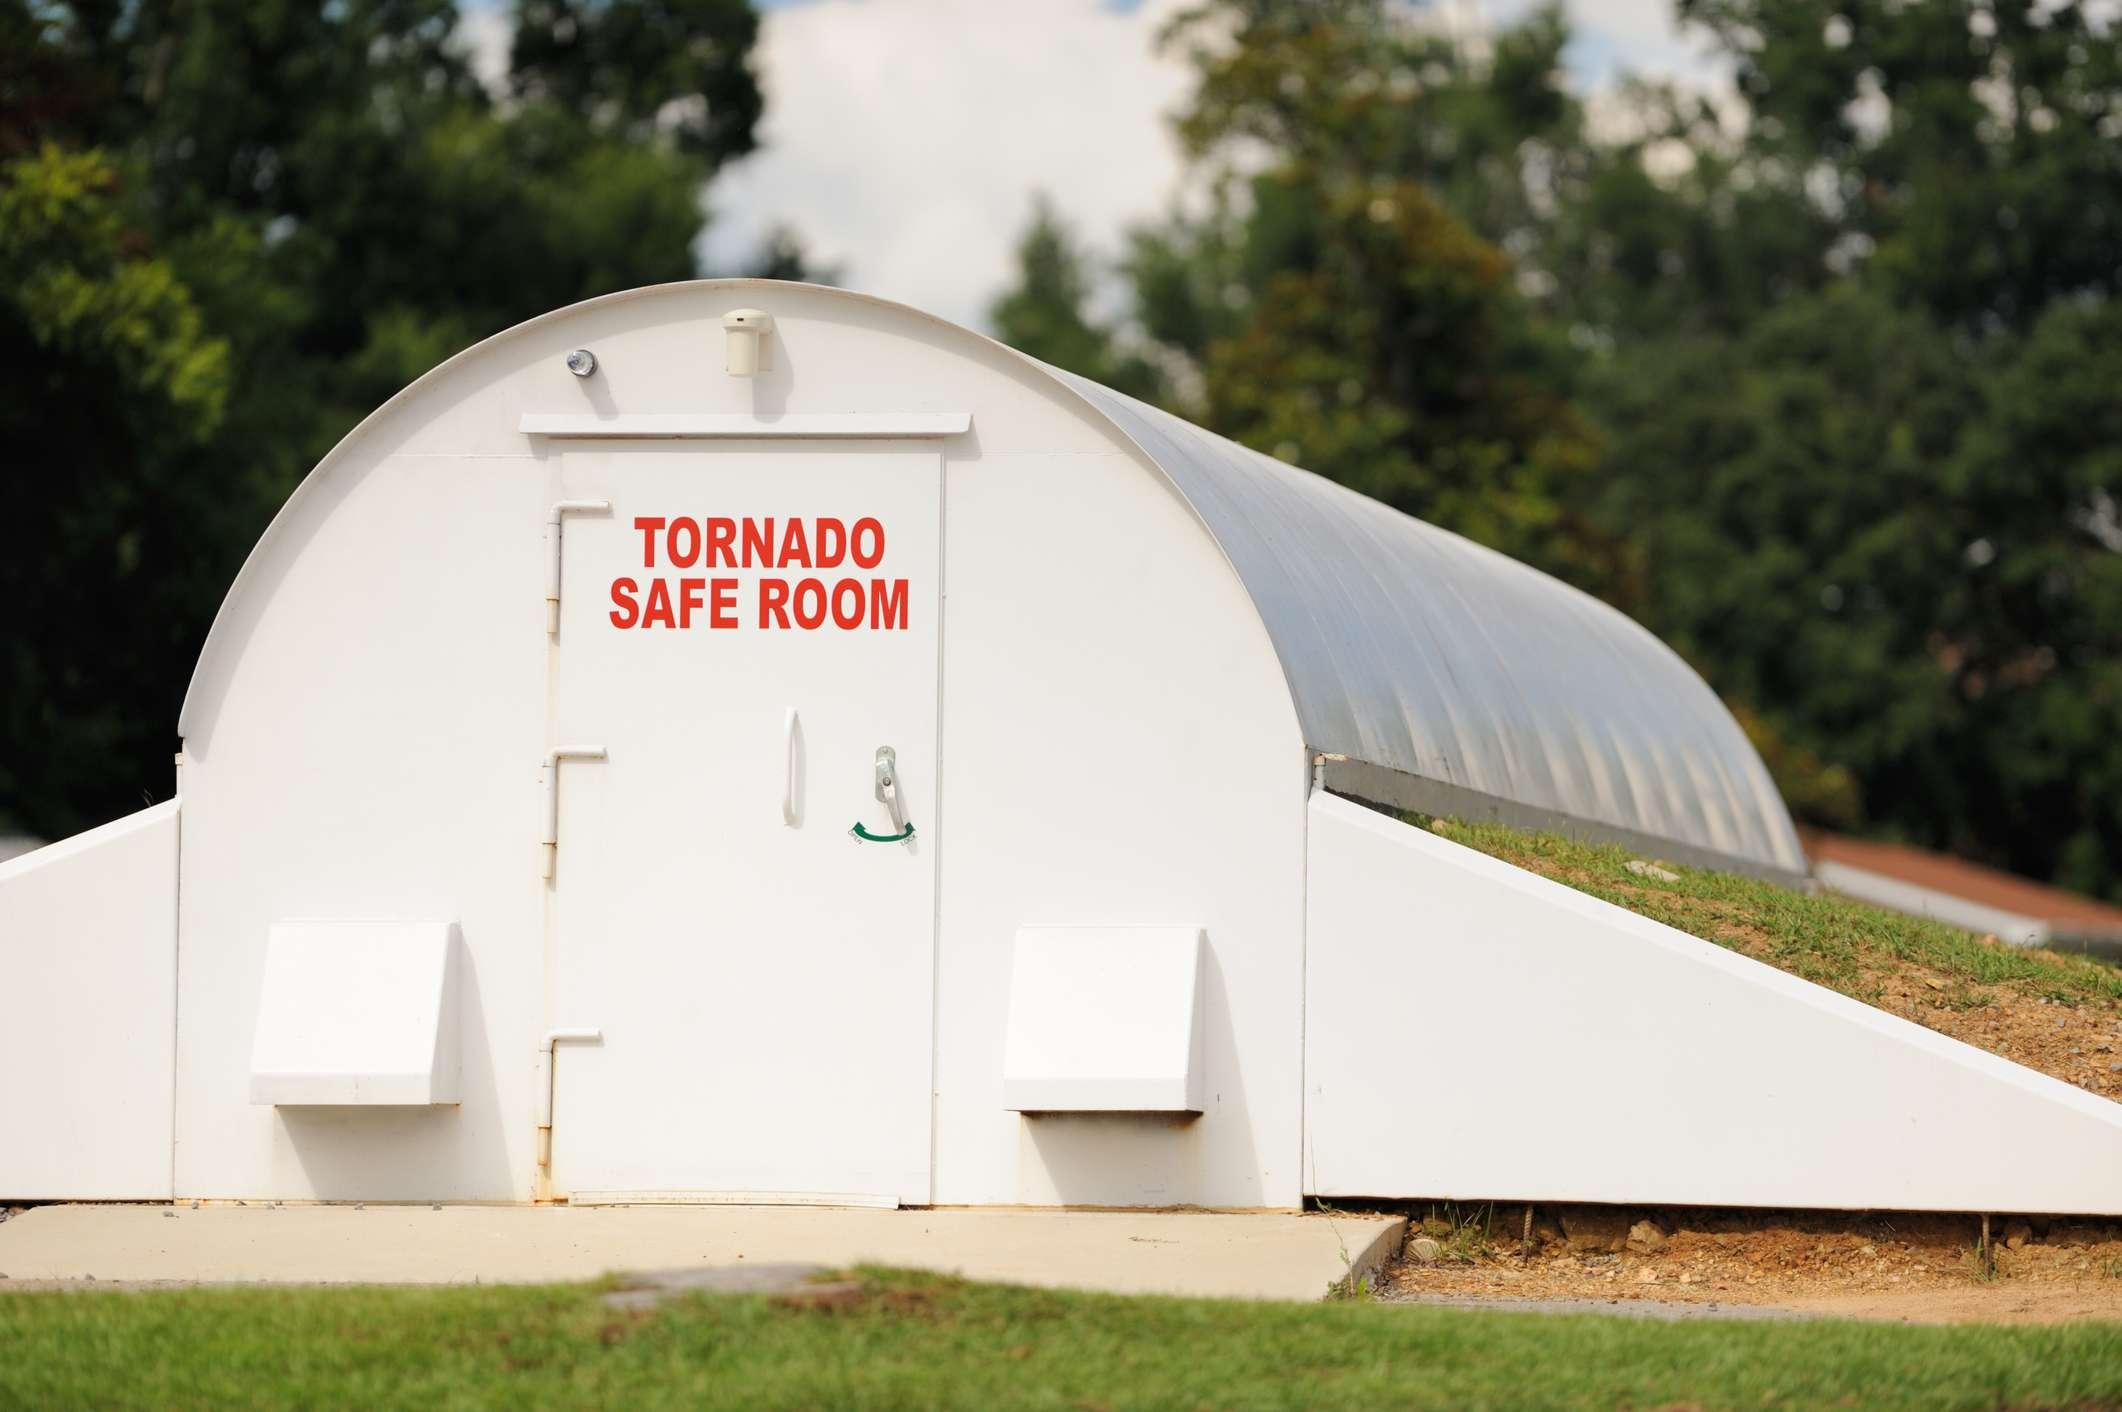 Tornado safe room version 2